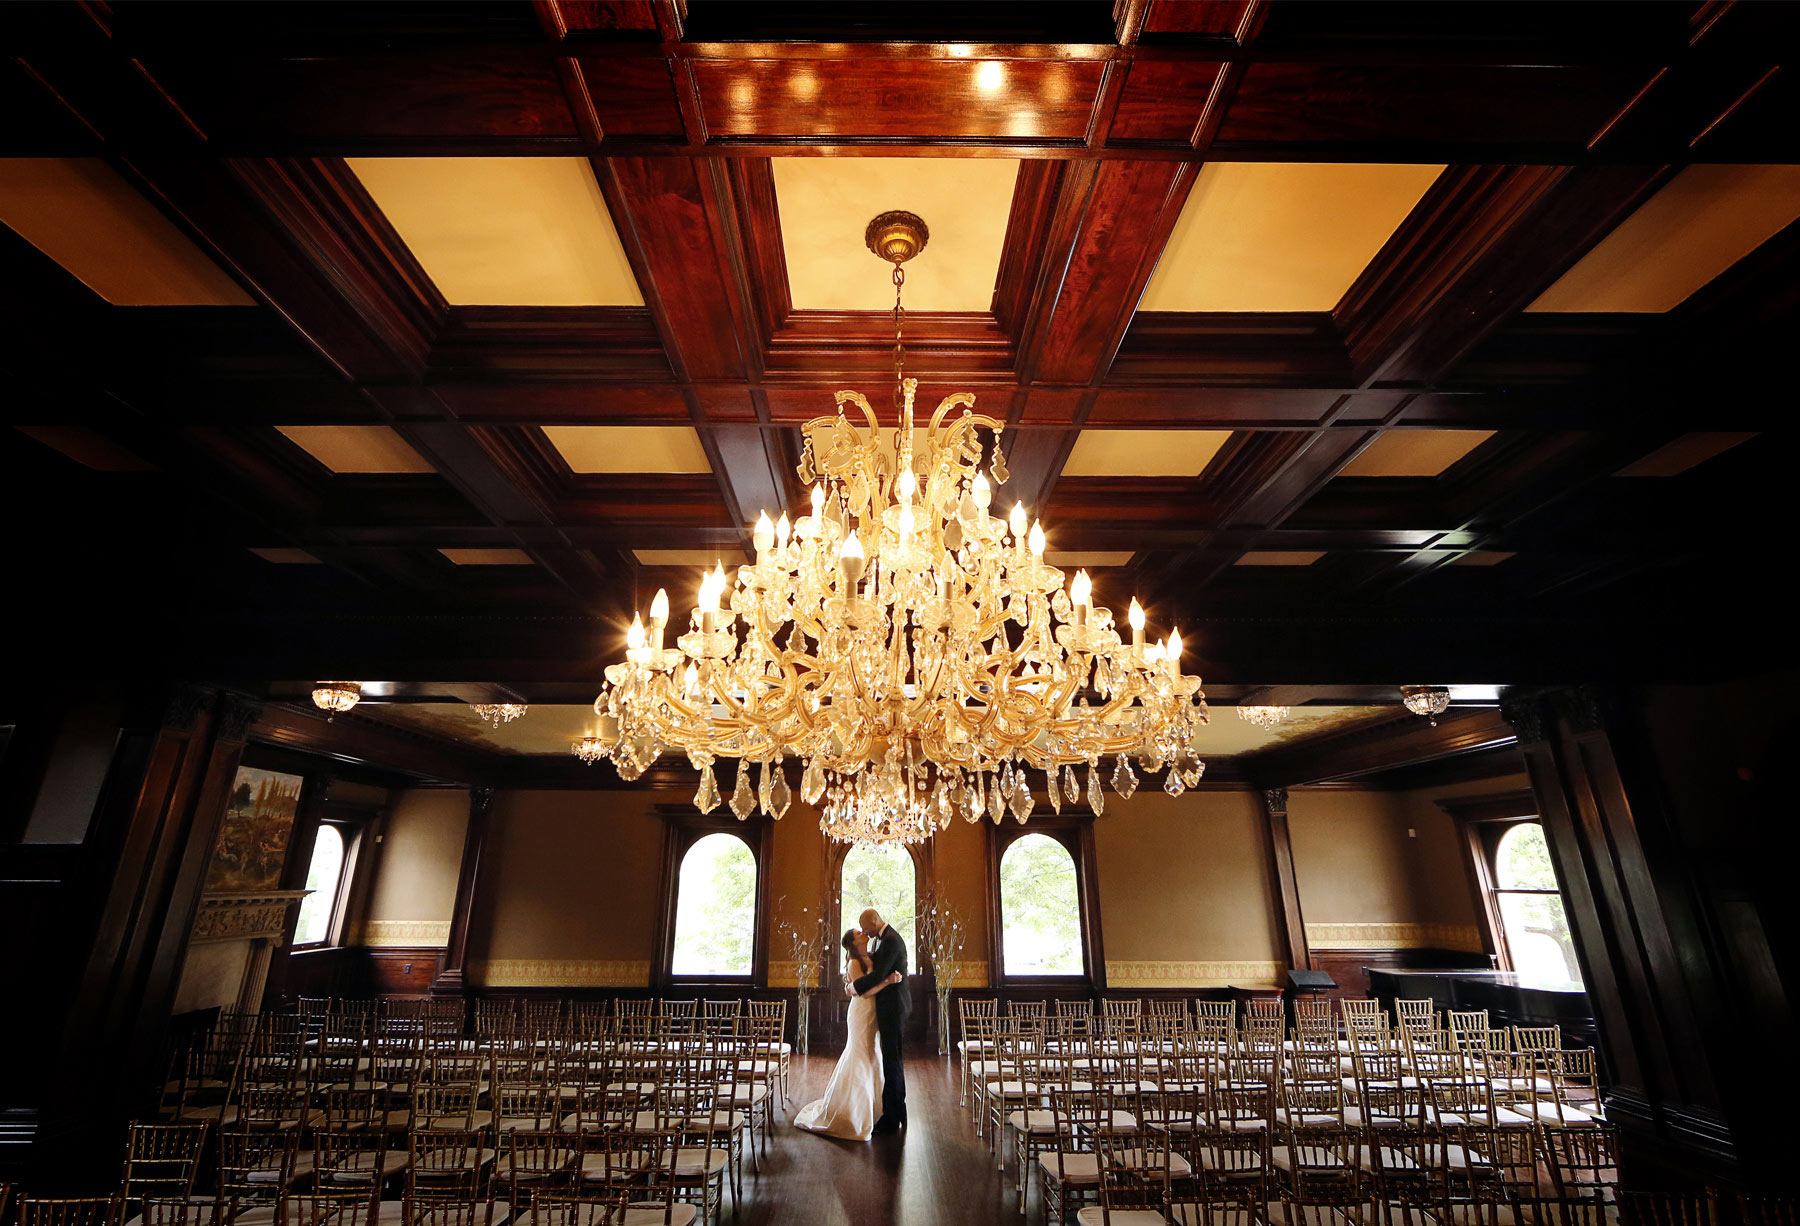 04-Minneapolis-Minnesota-Wedding-Photography-by-Vick-Photography-Semple-Mansion-First-Look-Nikki-and-Matt.jpg